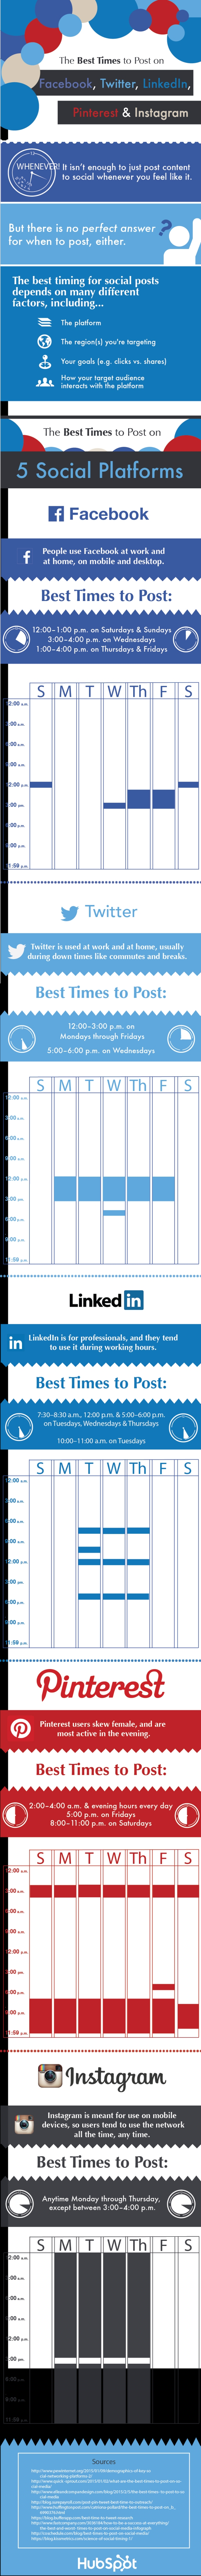 The Best Times to Post on Facebook, Twitter, LinkedIn, Pinterest & Instagram